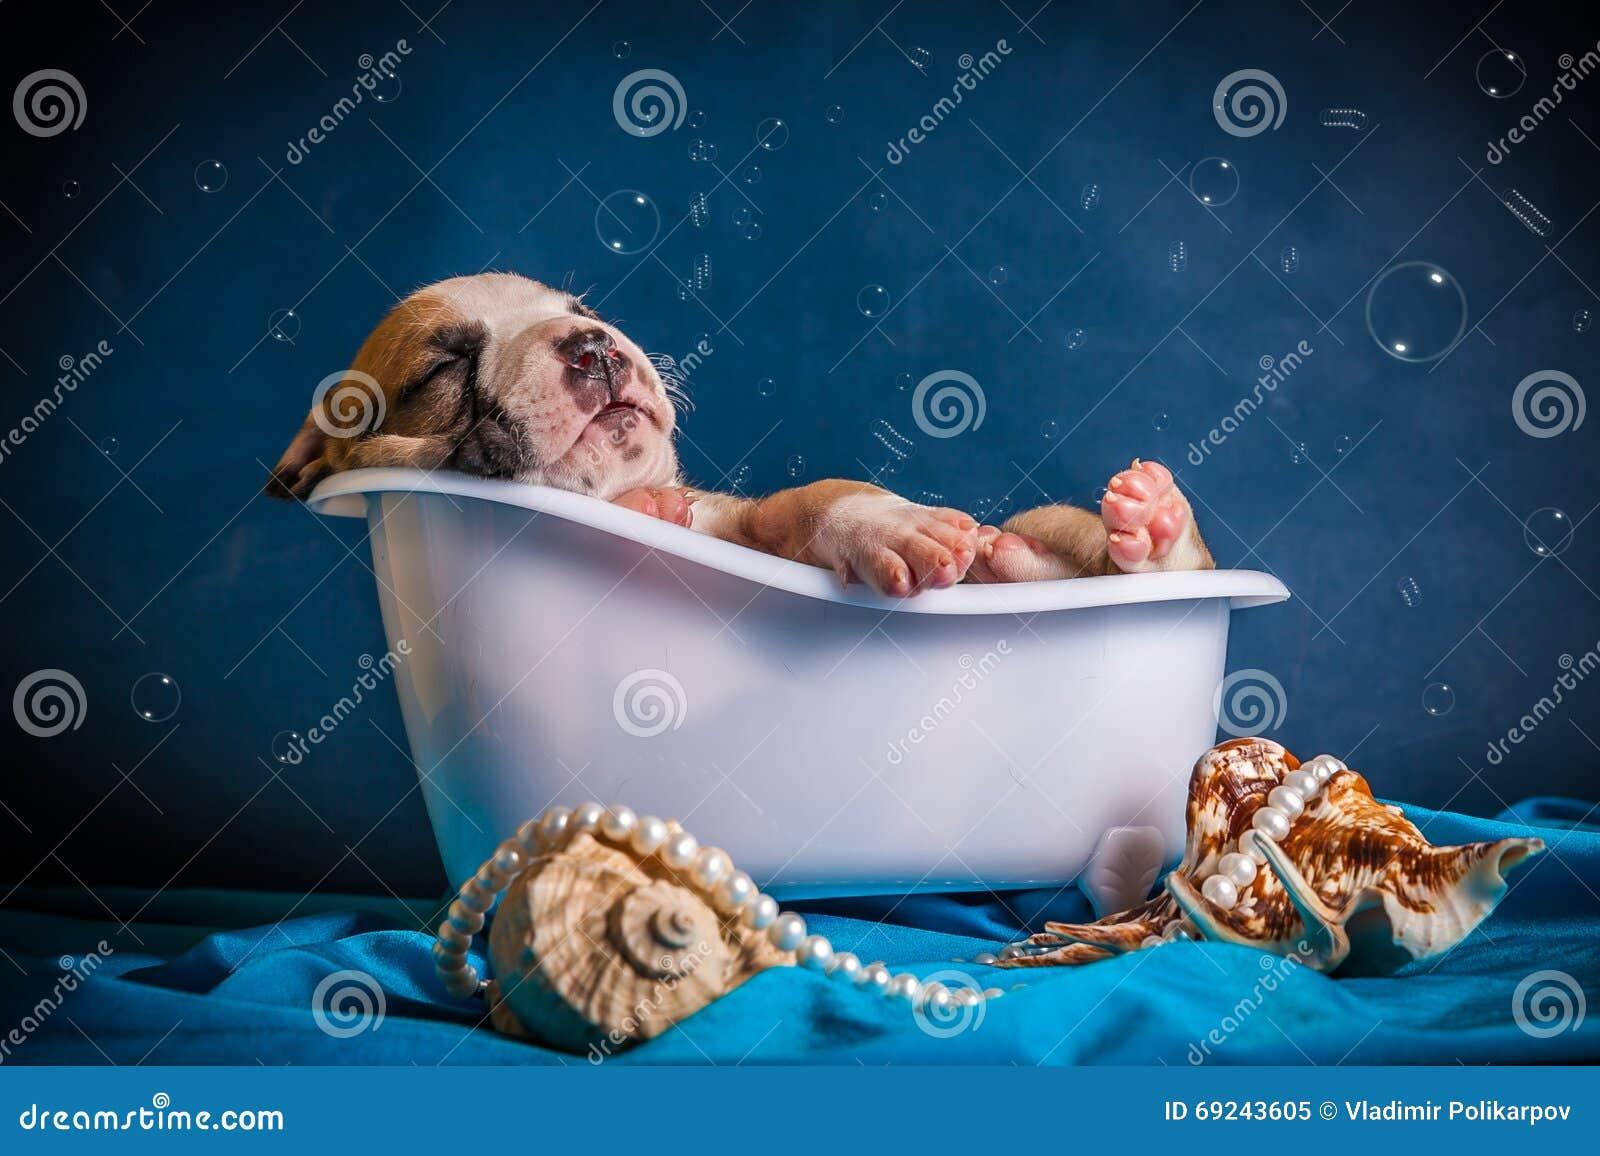 Pitbull sleeping in the bath